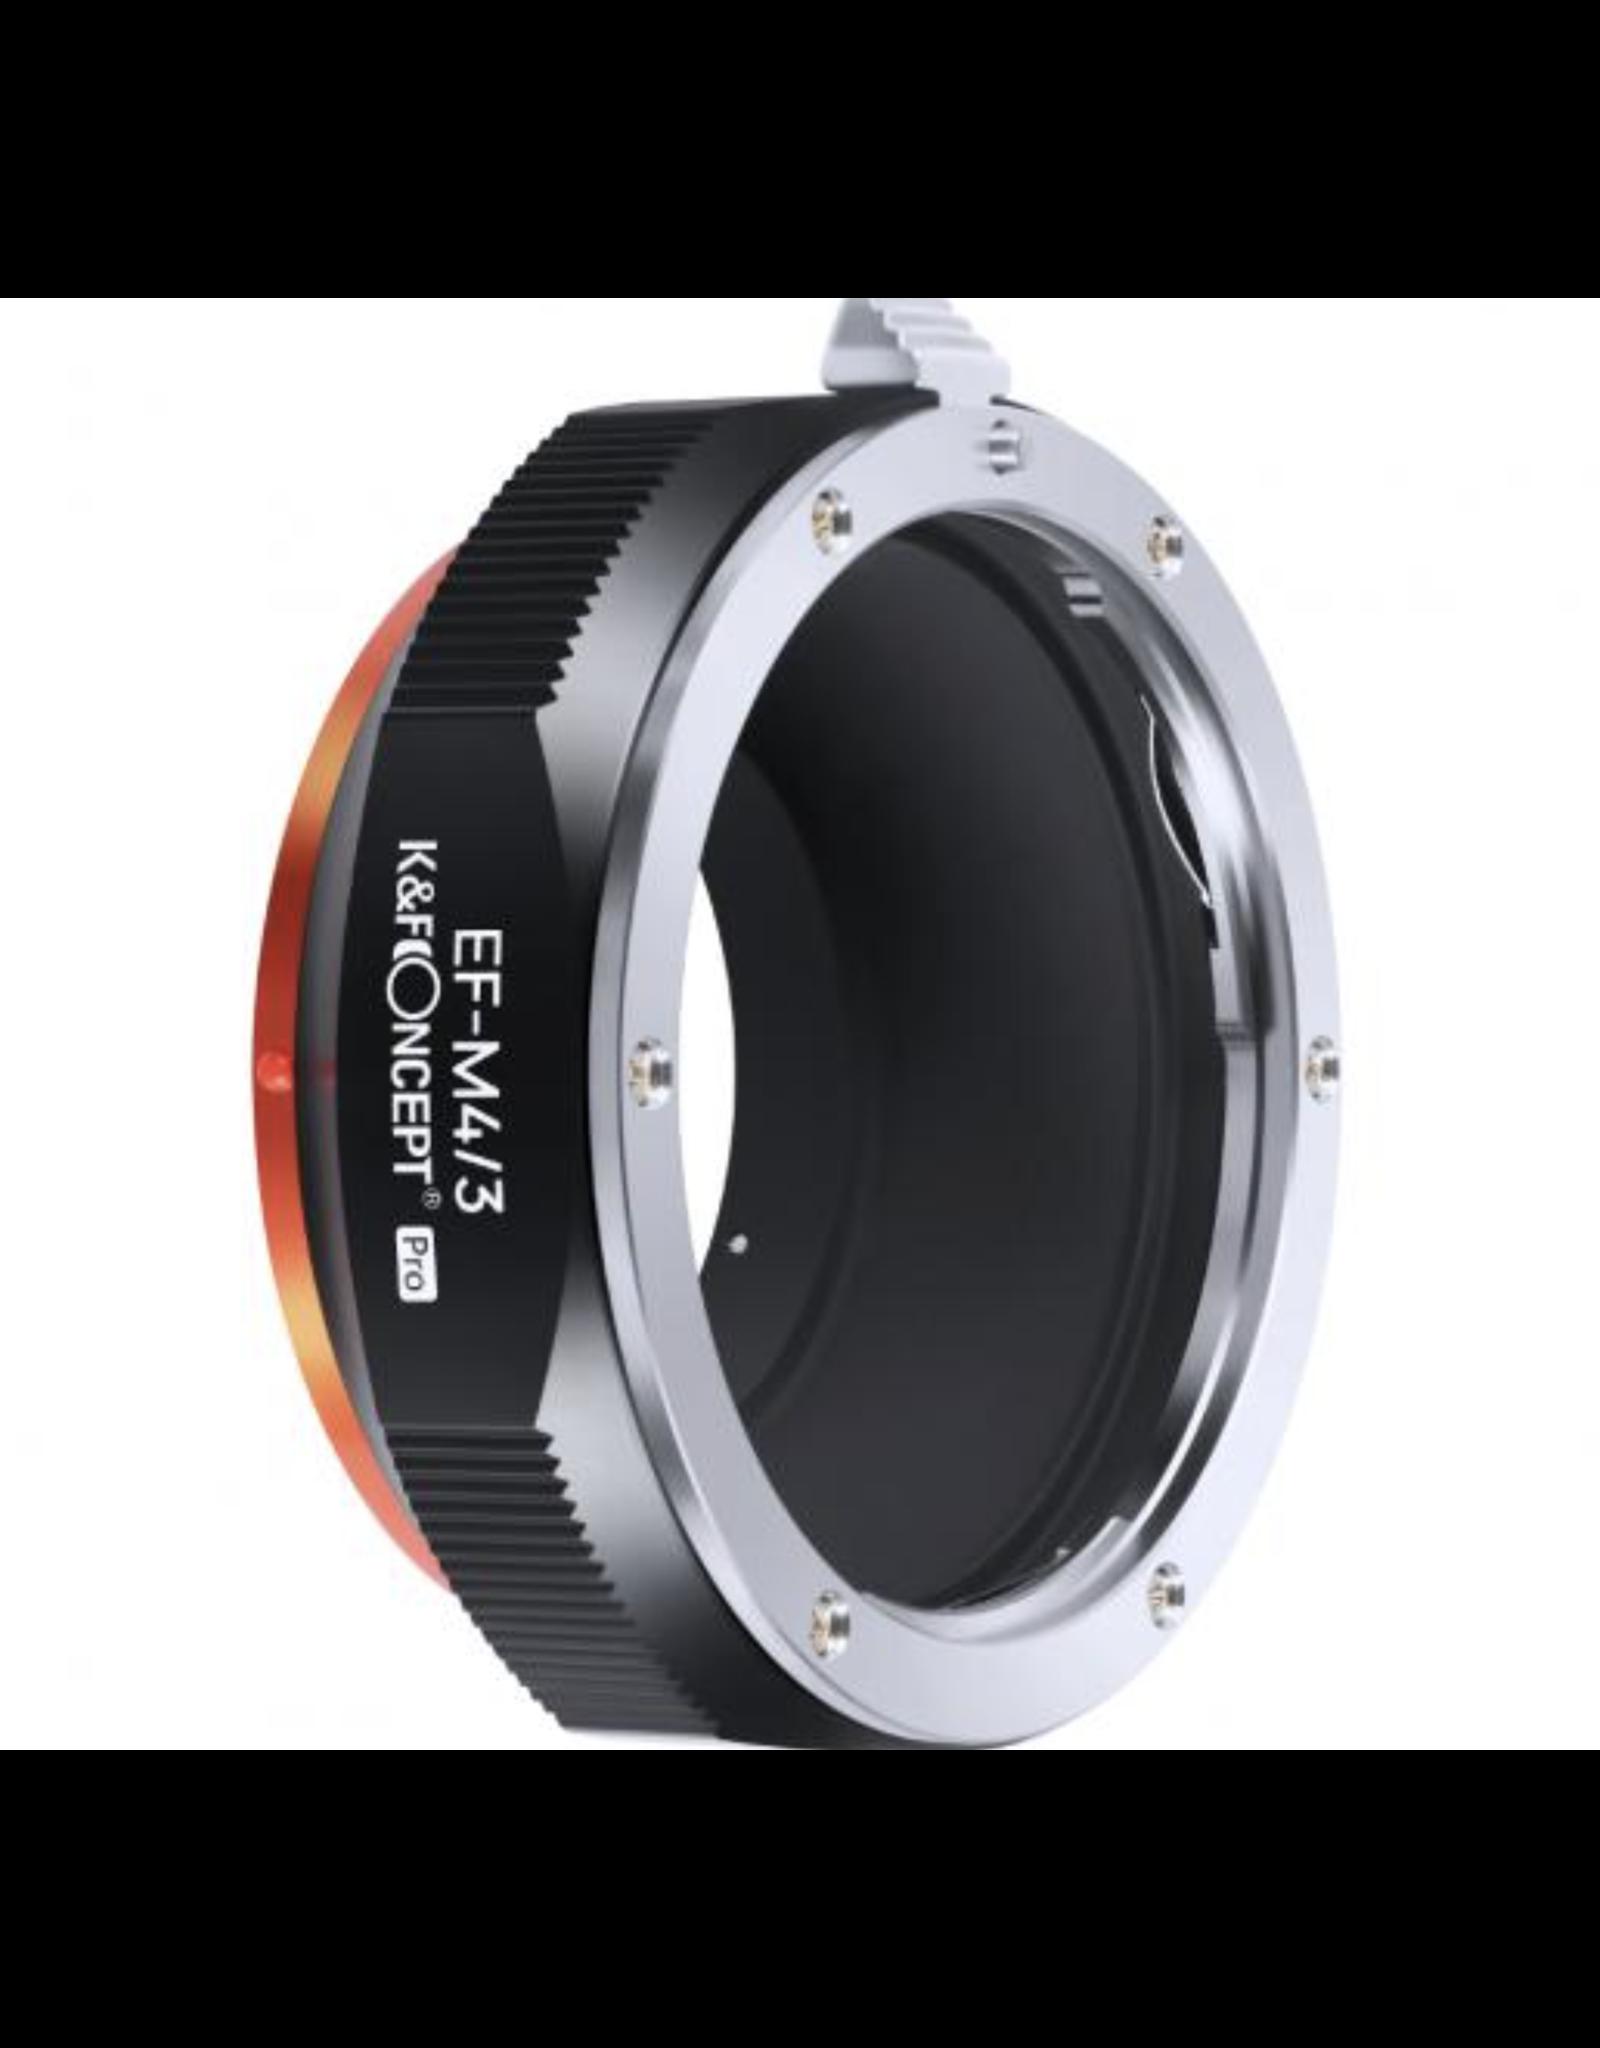 K&F K&F Concept Lens Adapter EOS-M4/3